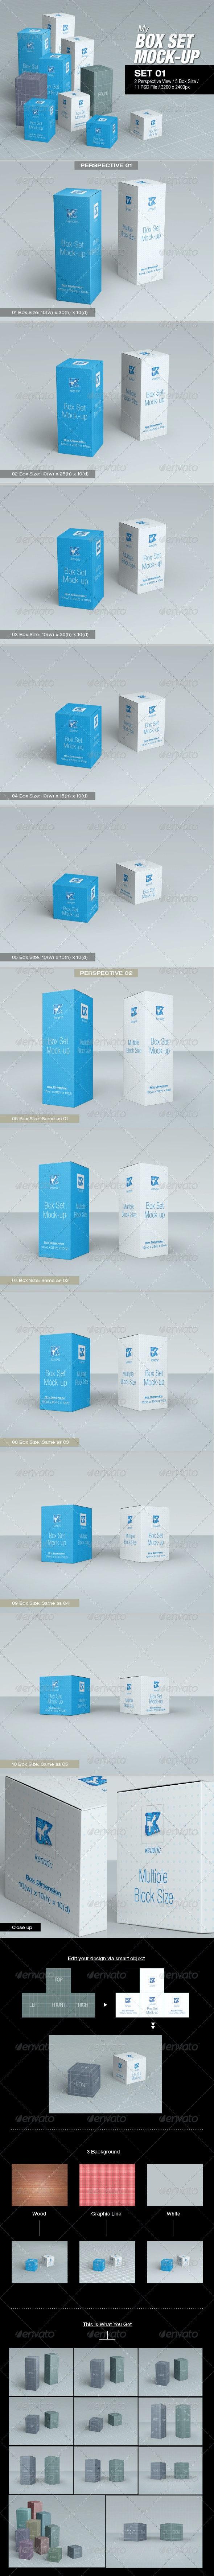 MyBox Set Mock-up 01 - Packaging Product Mock-Ups